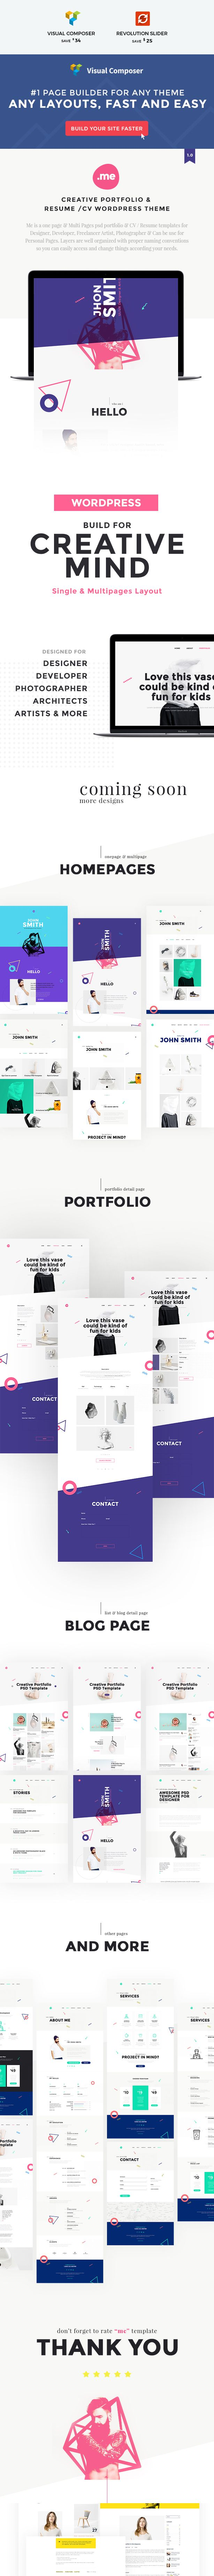 best ideas about web developer cv web portfolio creative portfolio resume cv wordpress theme